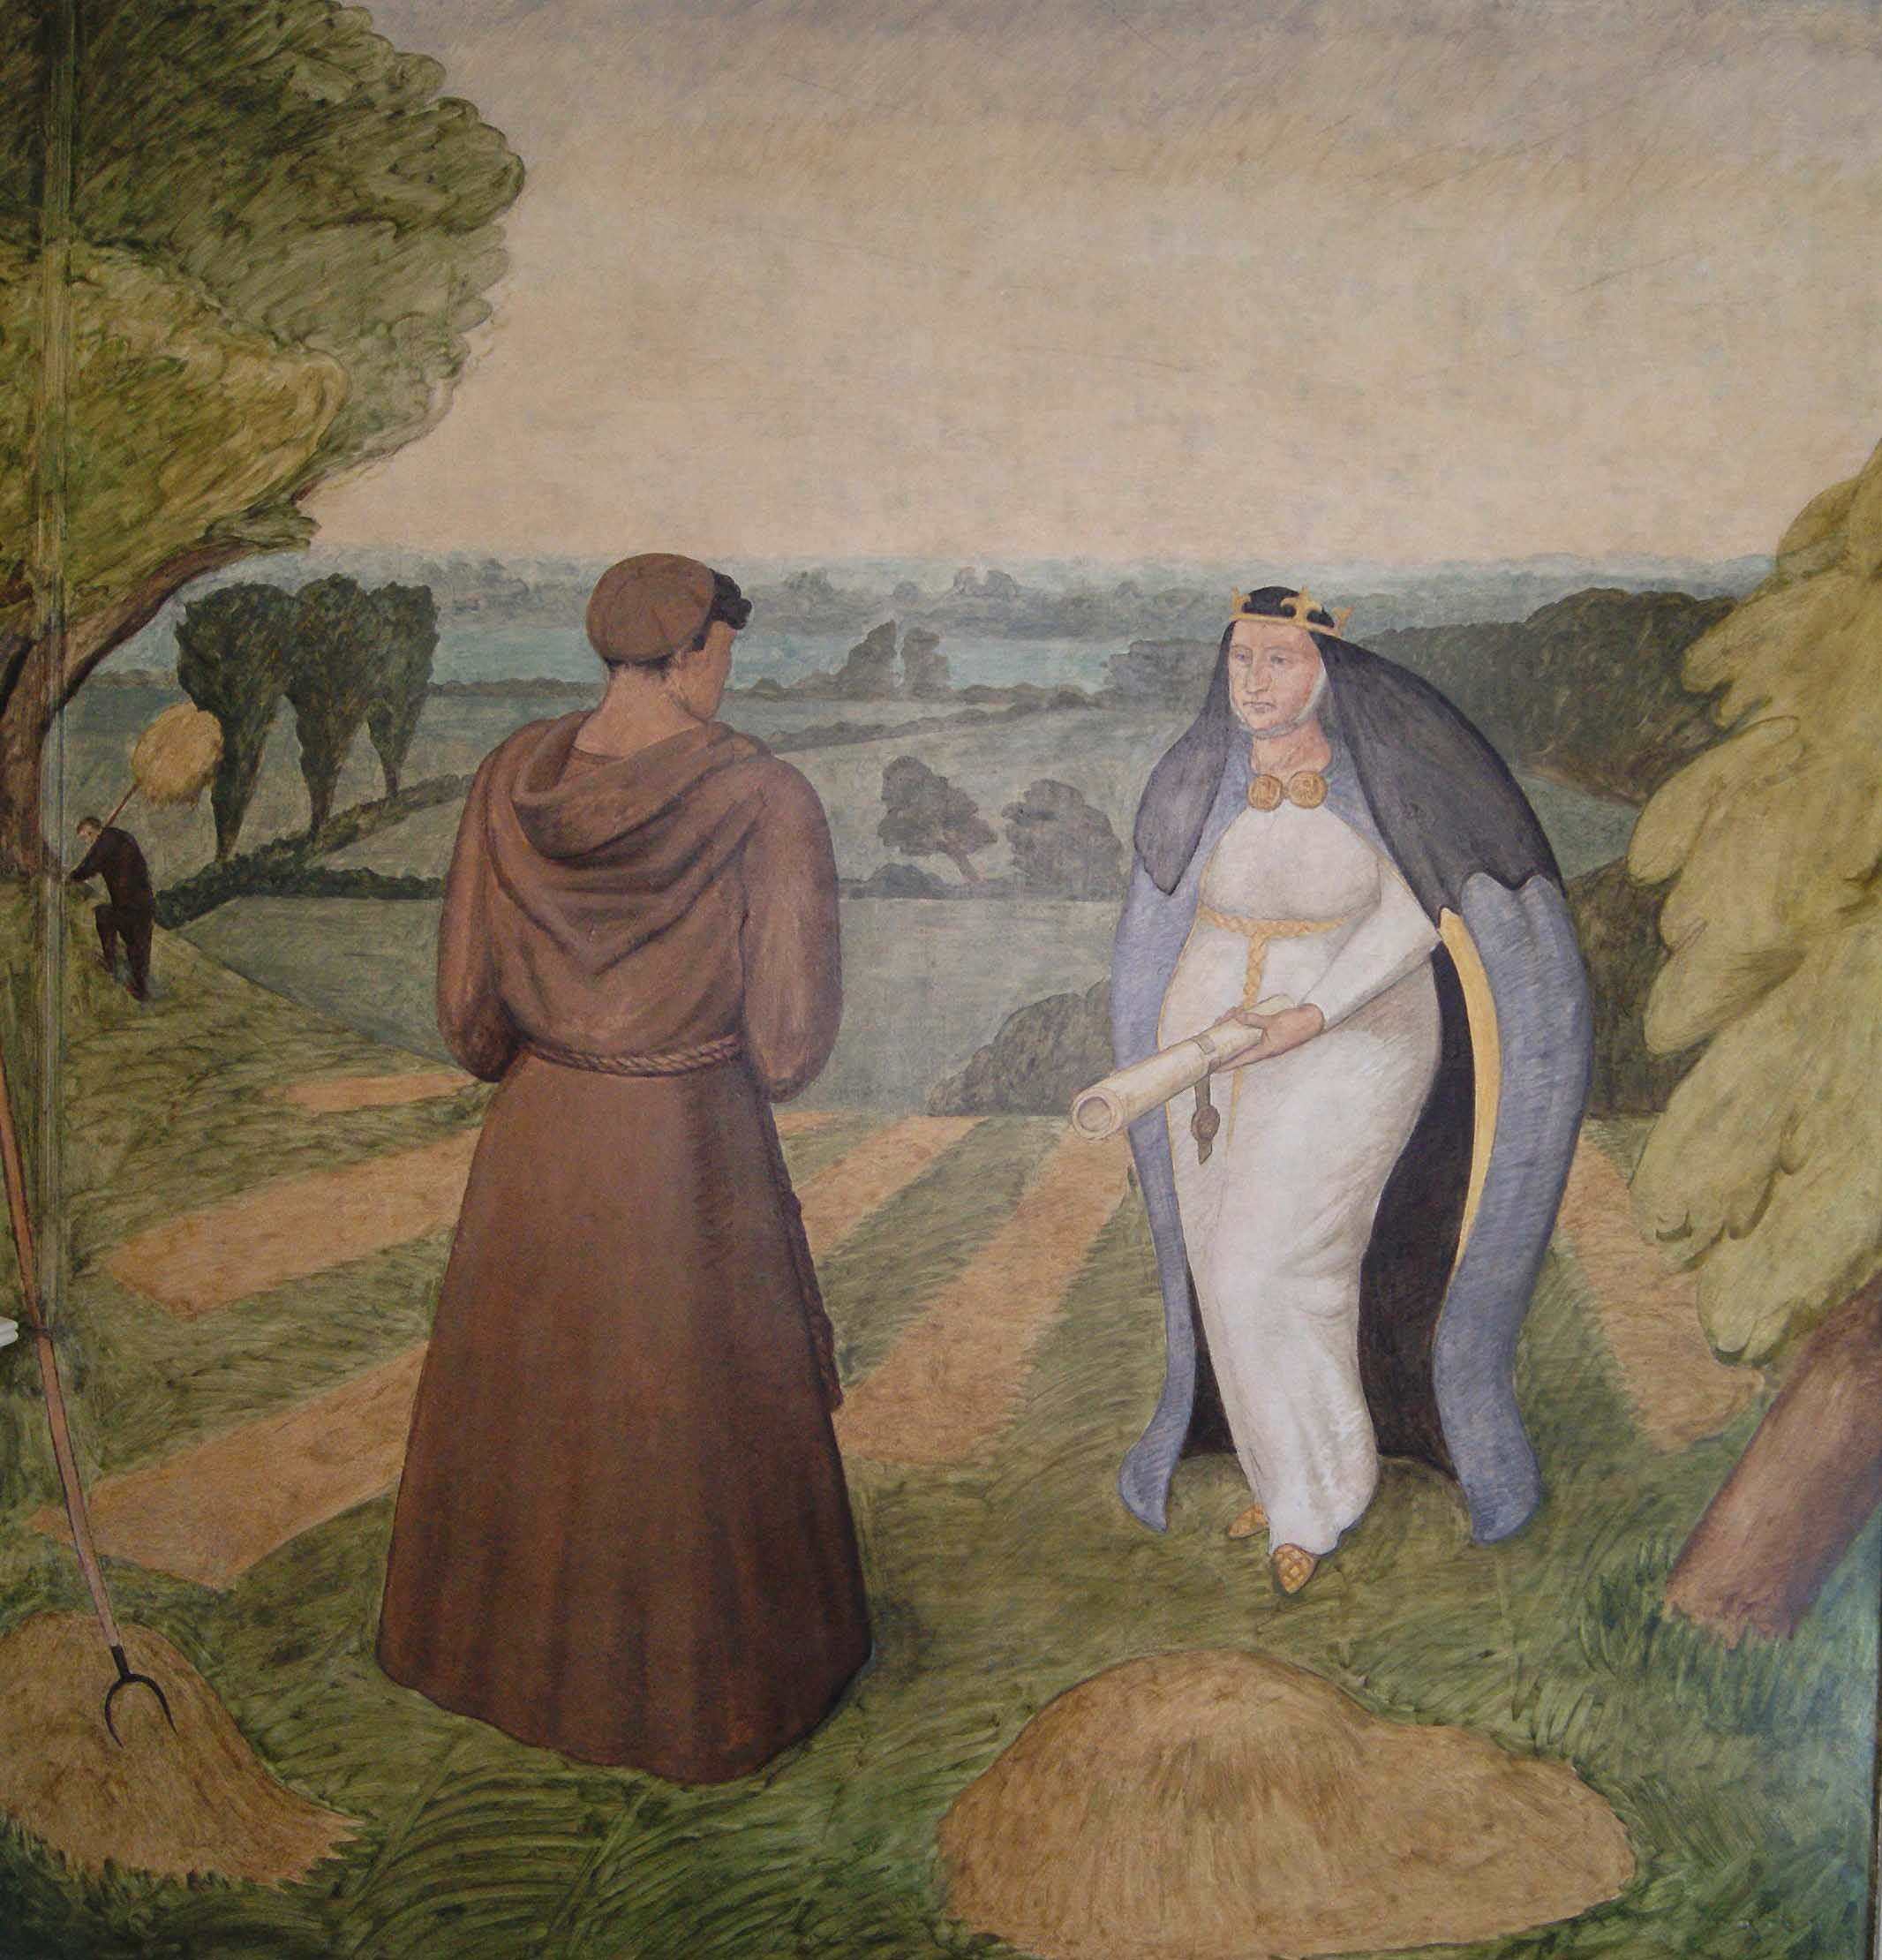 Balliol College mural by C. Fremantle (photo: IFACS)